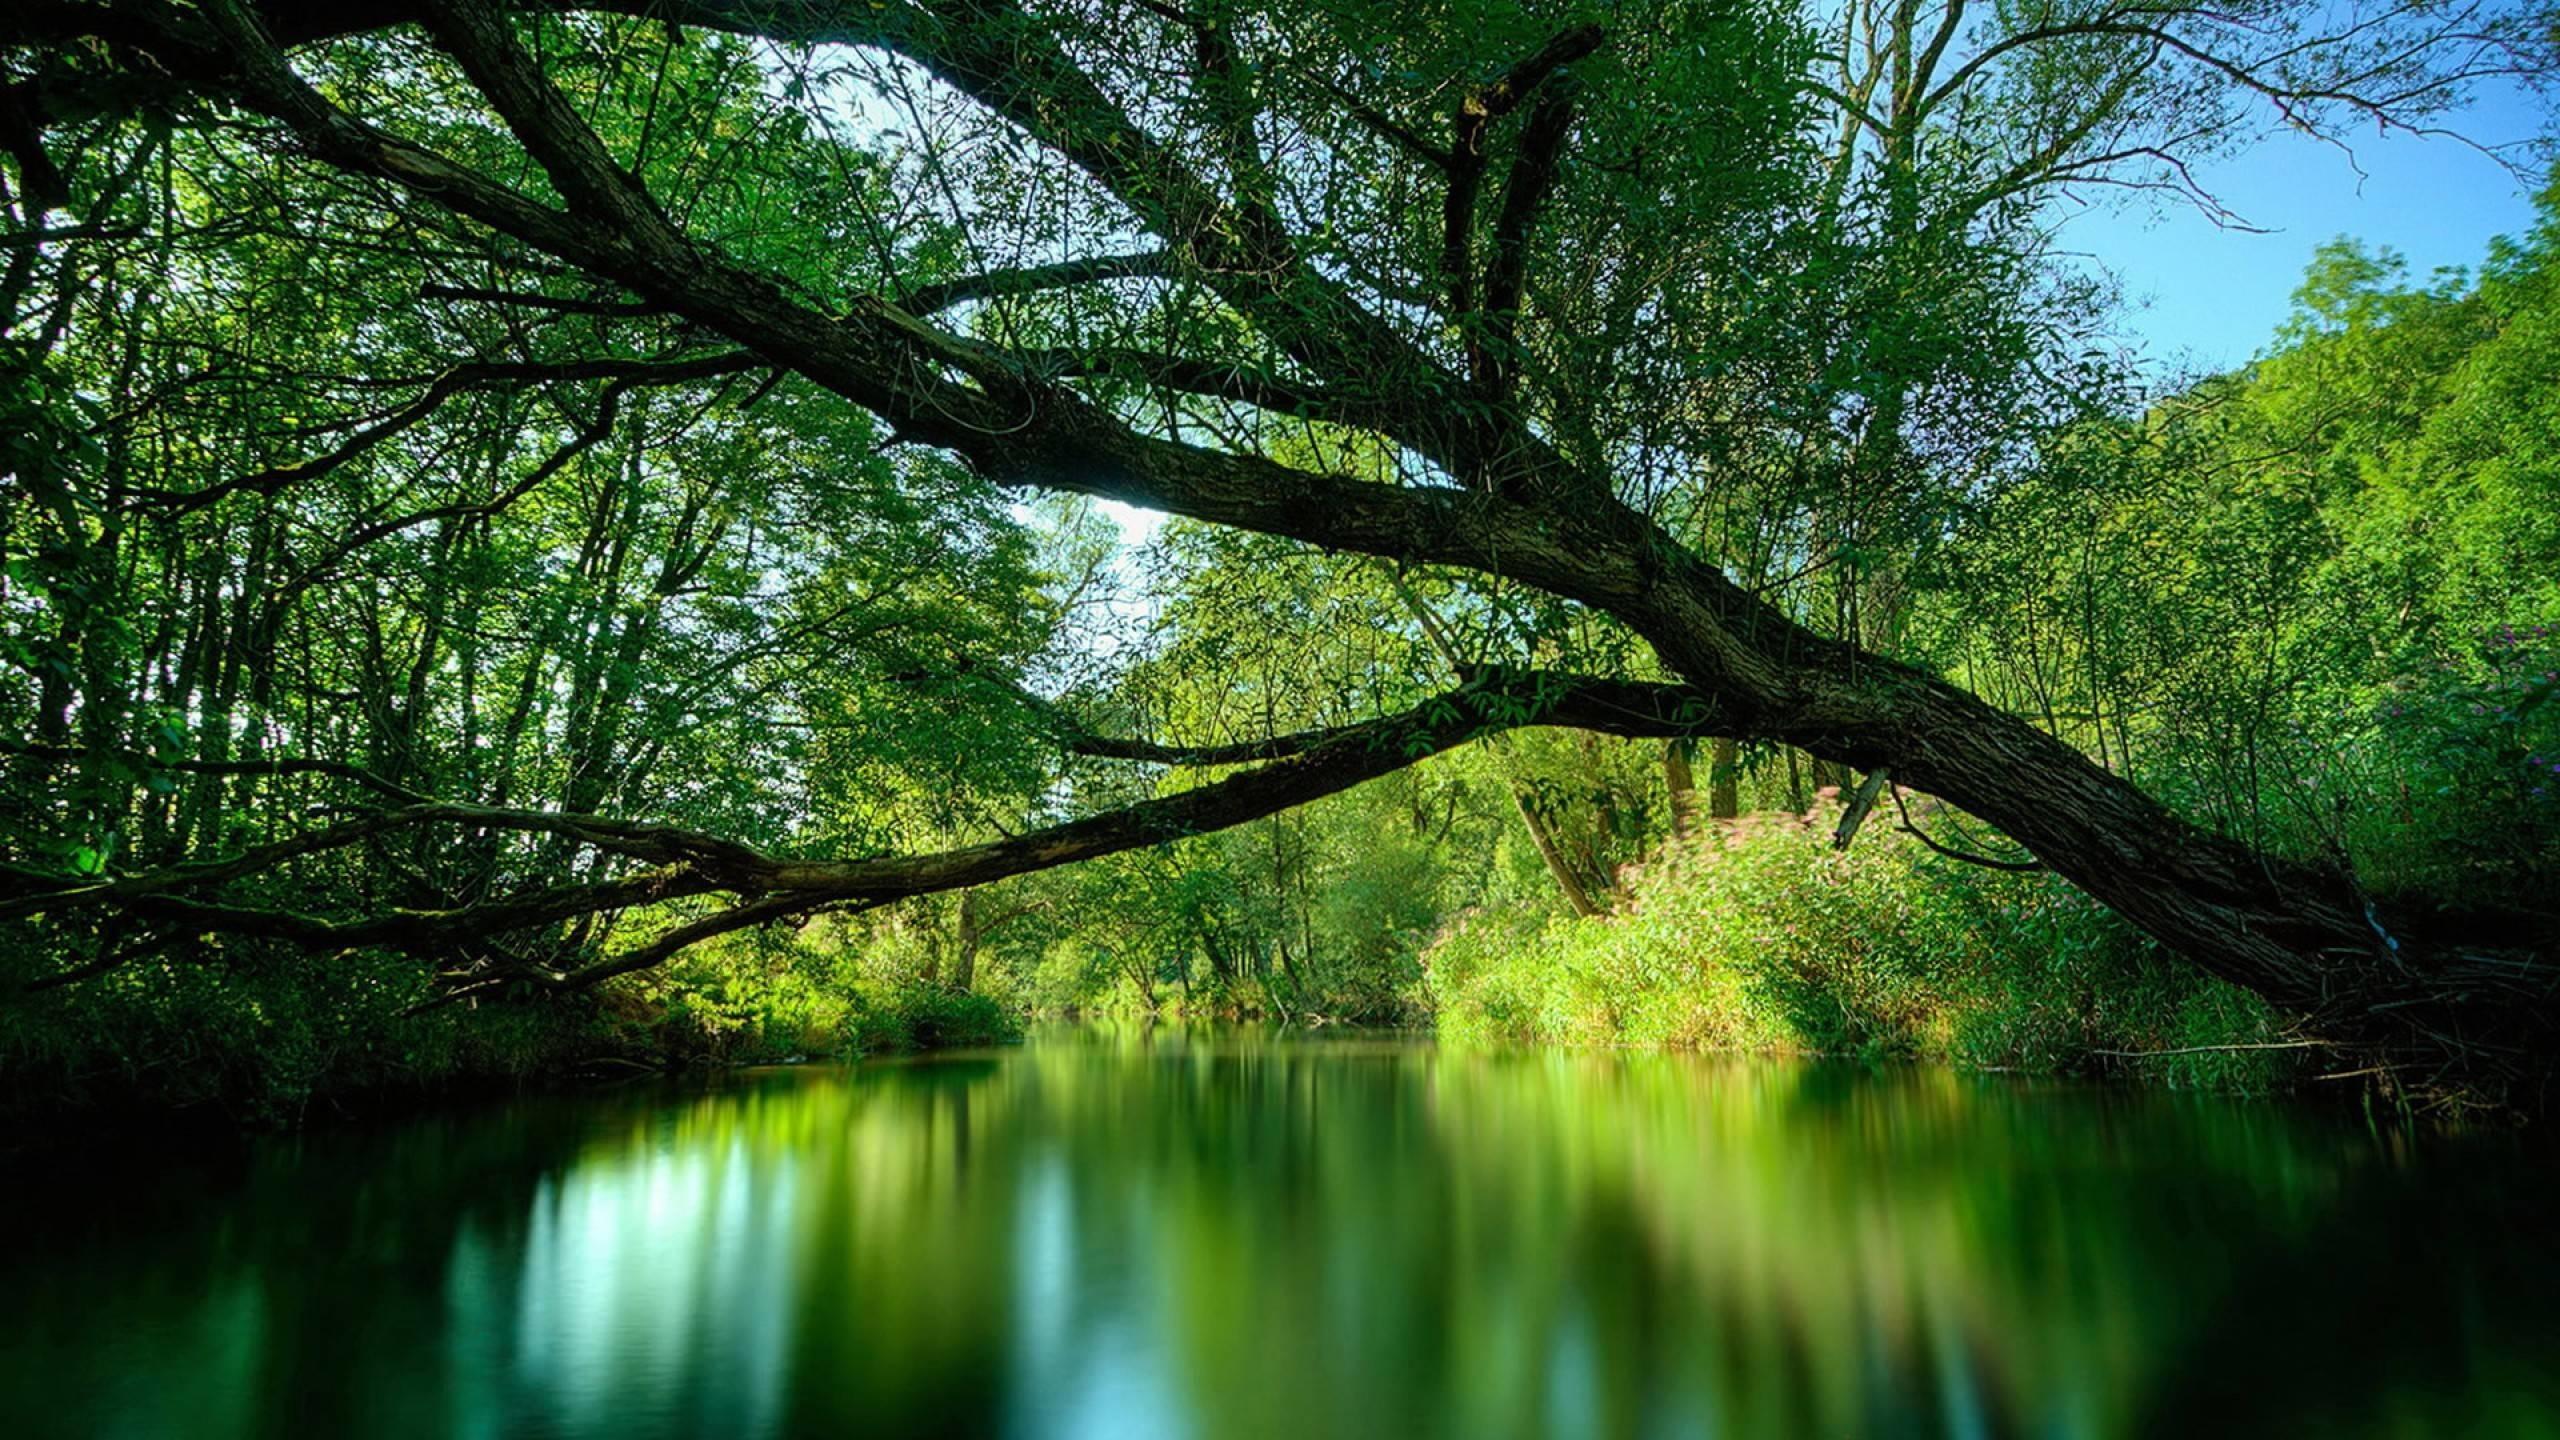 Res: 2560x1440, Rainforest Wallpaper Photo #MeX